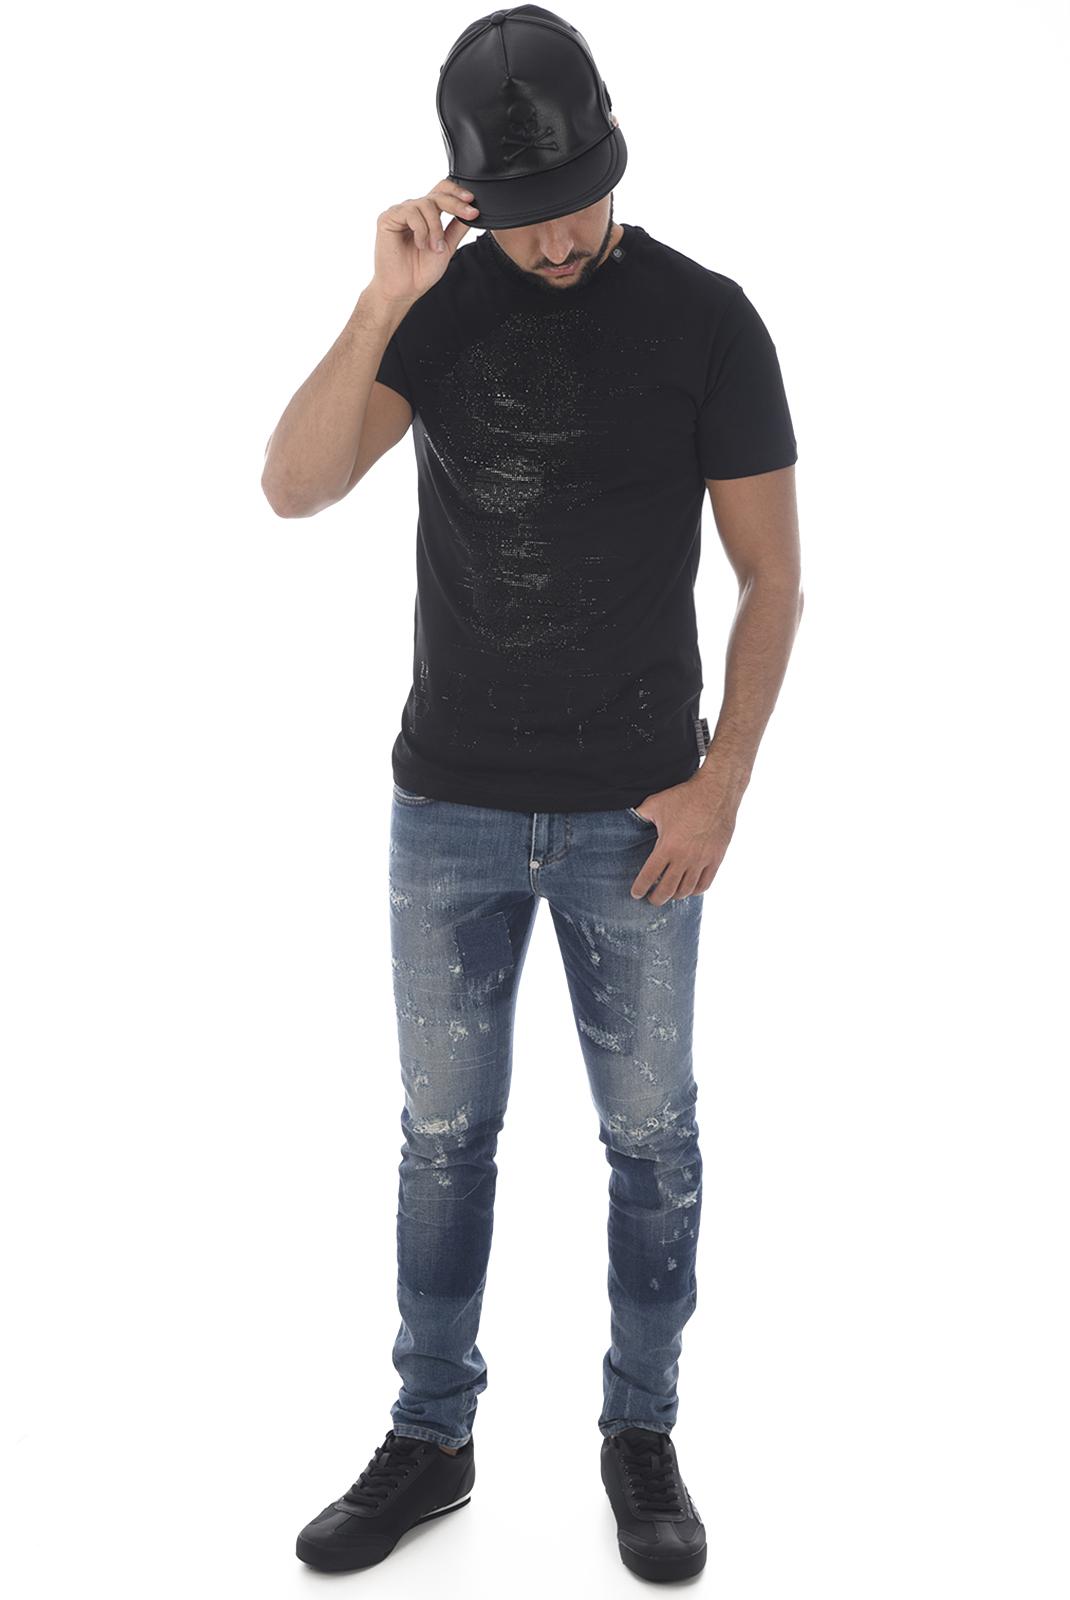 Bonnets / Casquettes  Philipp plein MAC0096 AVENTURA 02K BLACK/NICKEL